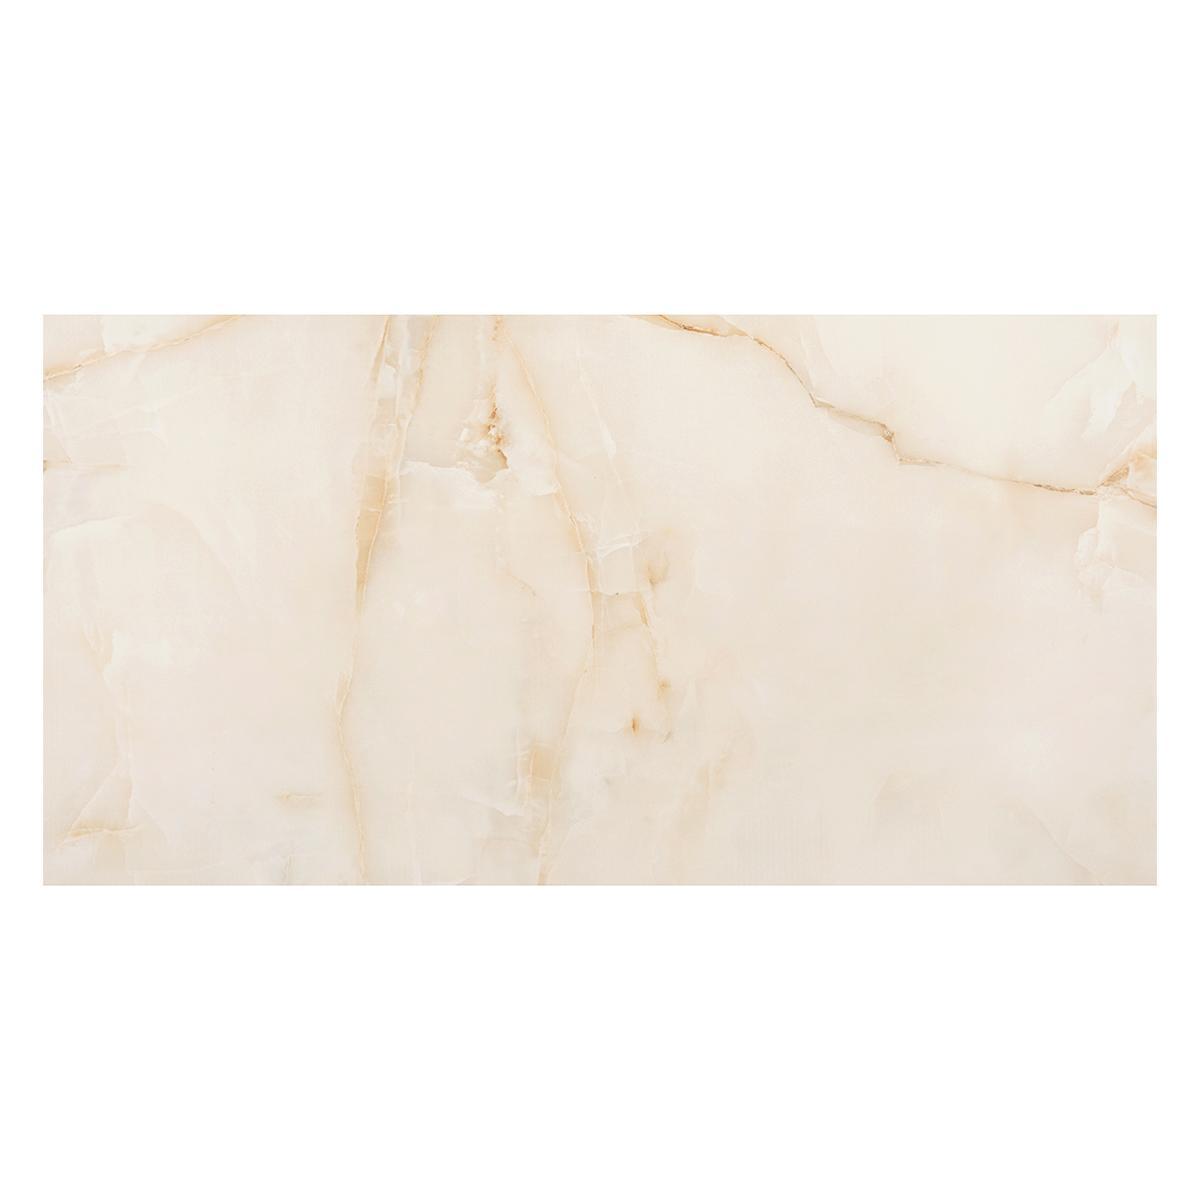 Porcelanato Onyx Beige Brillante - 60X120 cm - 1.44 m2